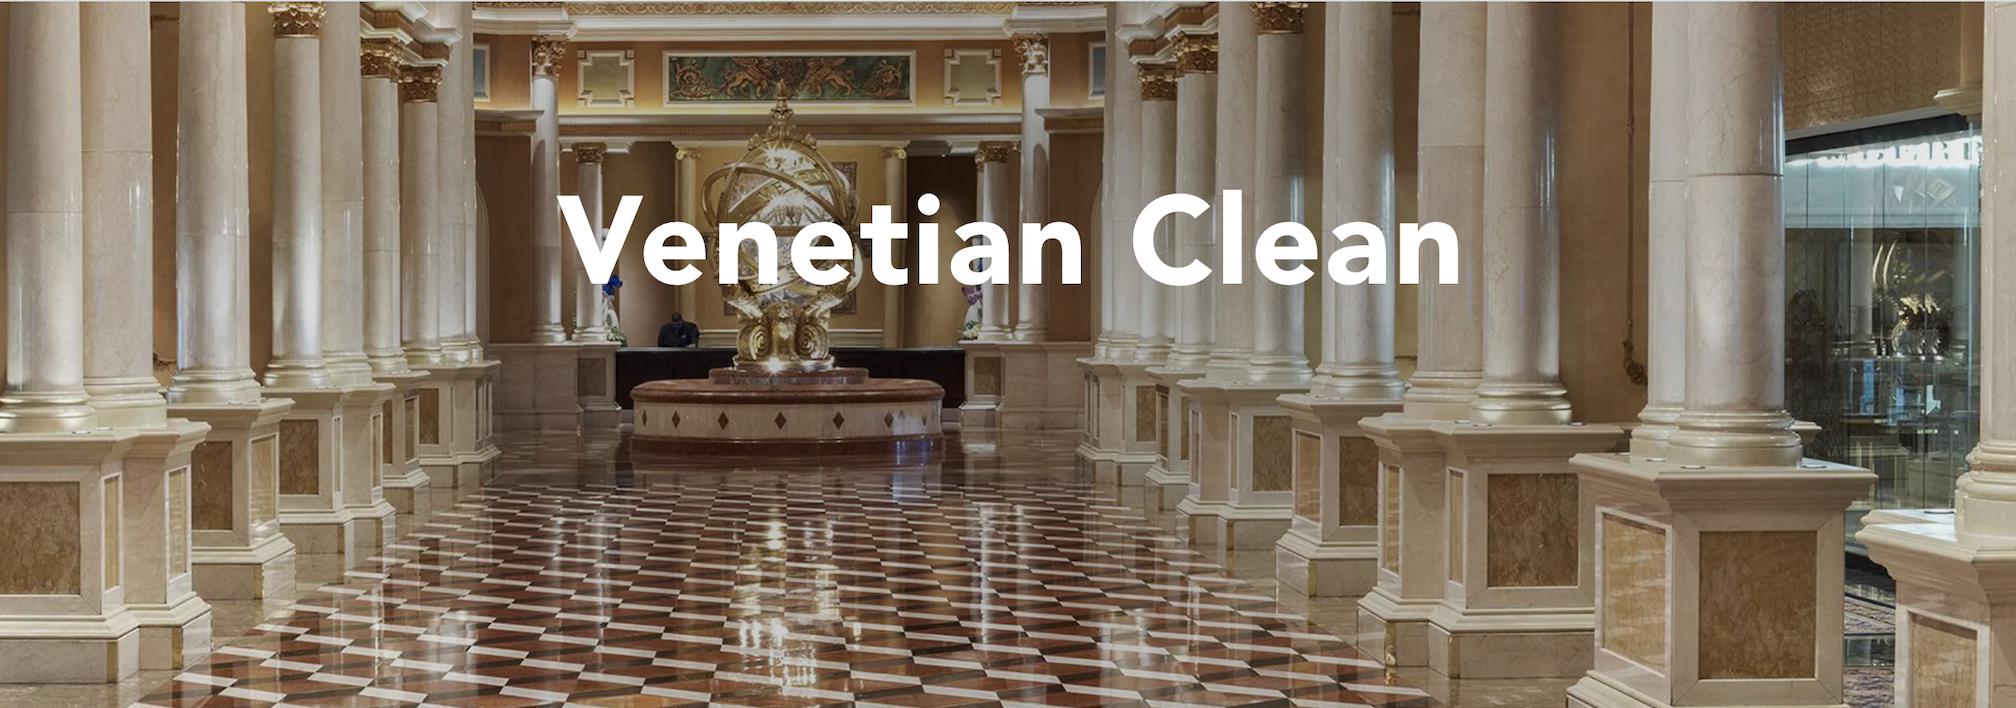 https://anysizedealsweek.com/wp-content/uploads/2020/05/Venetian-Clean-1.png